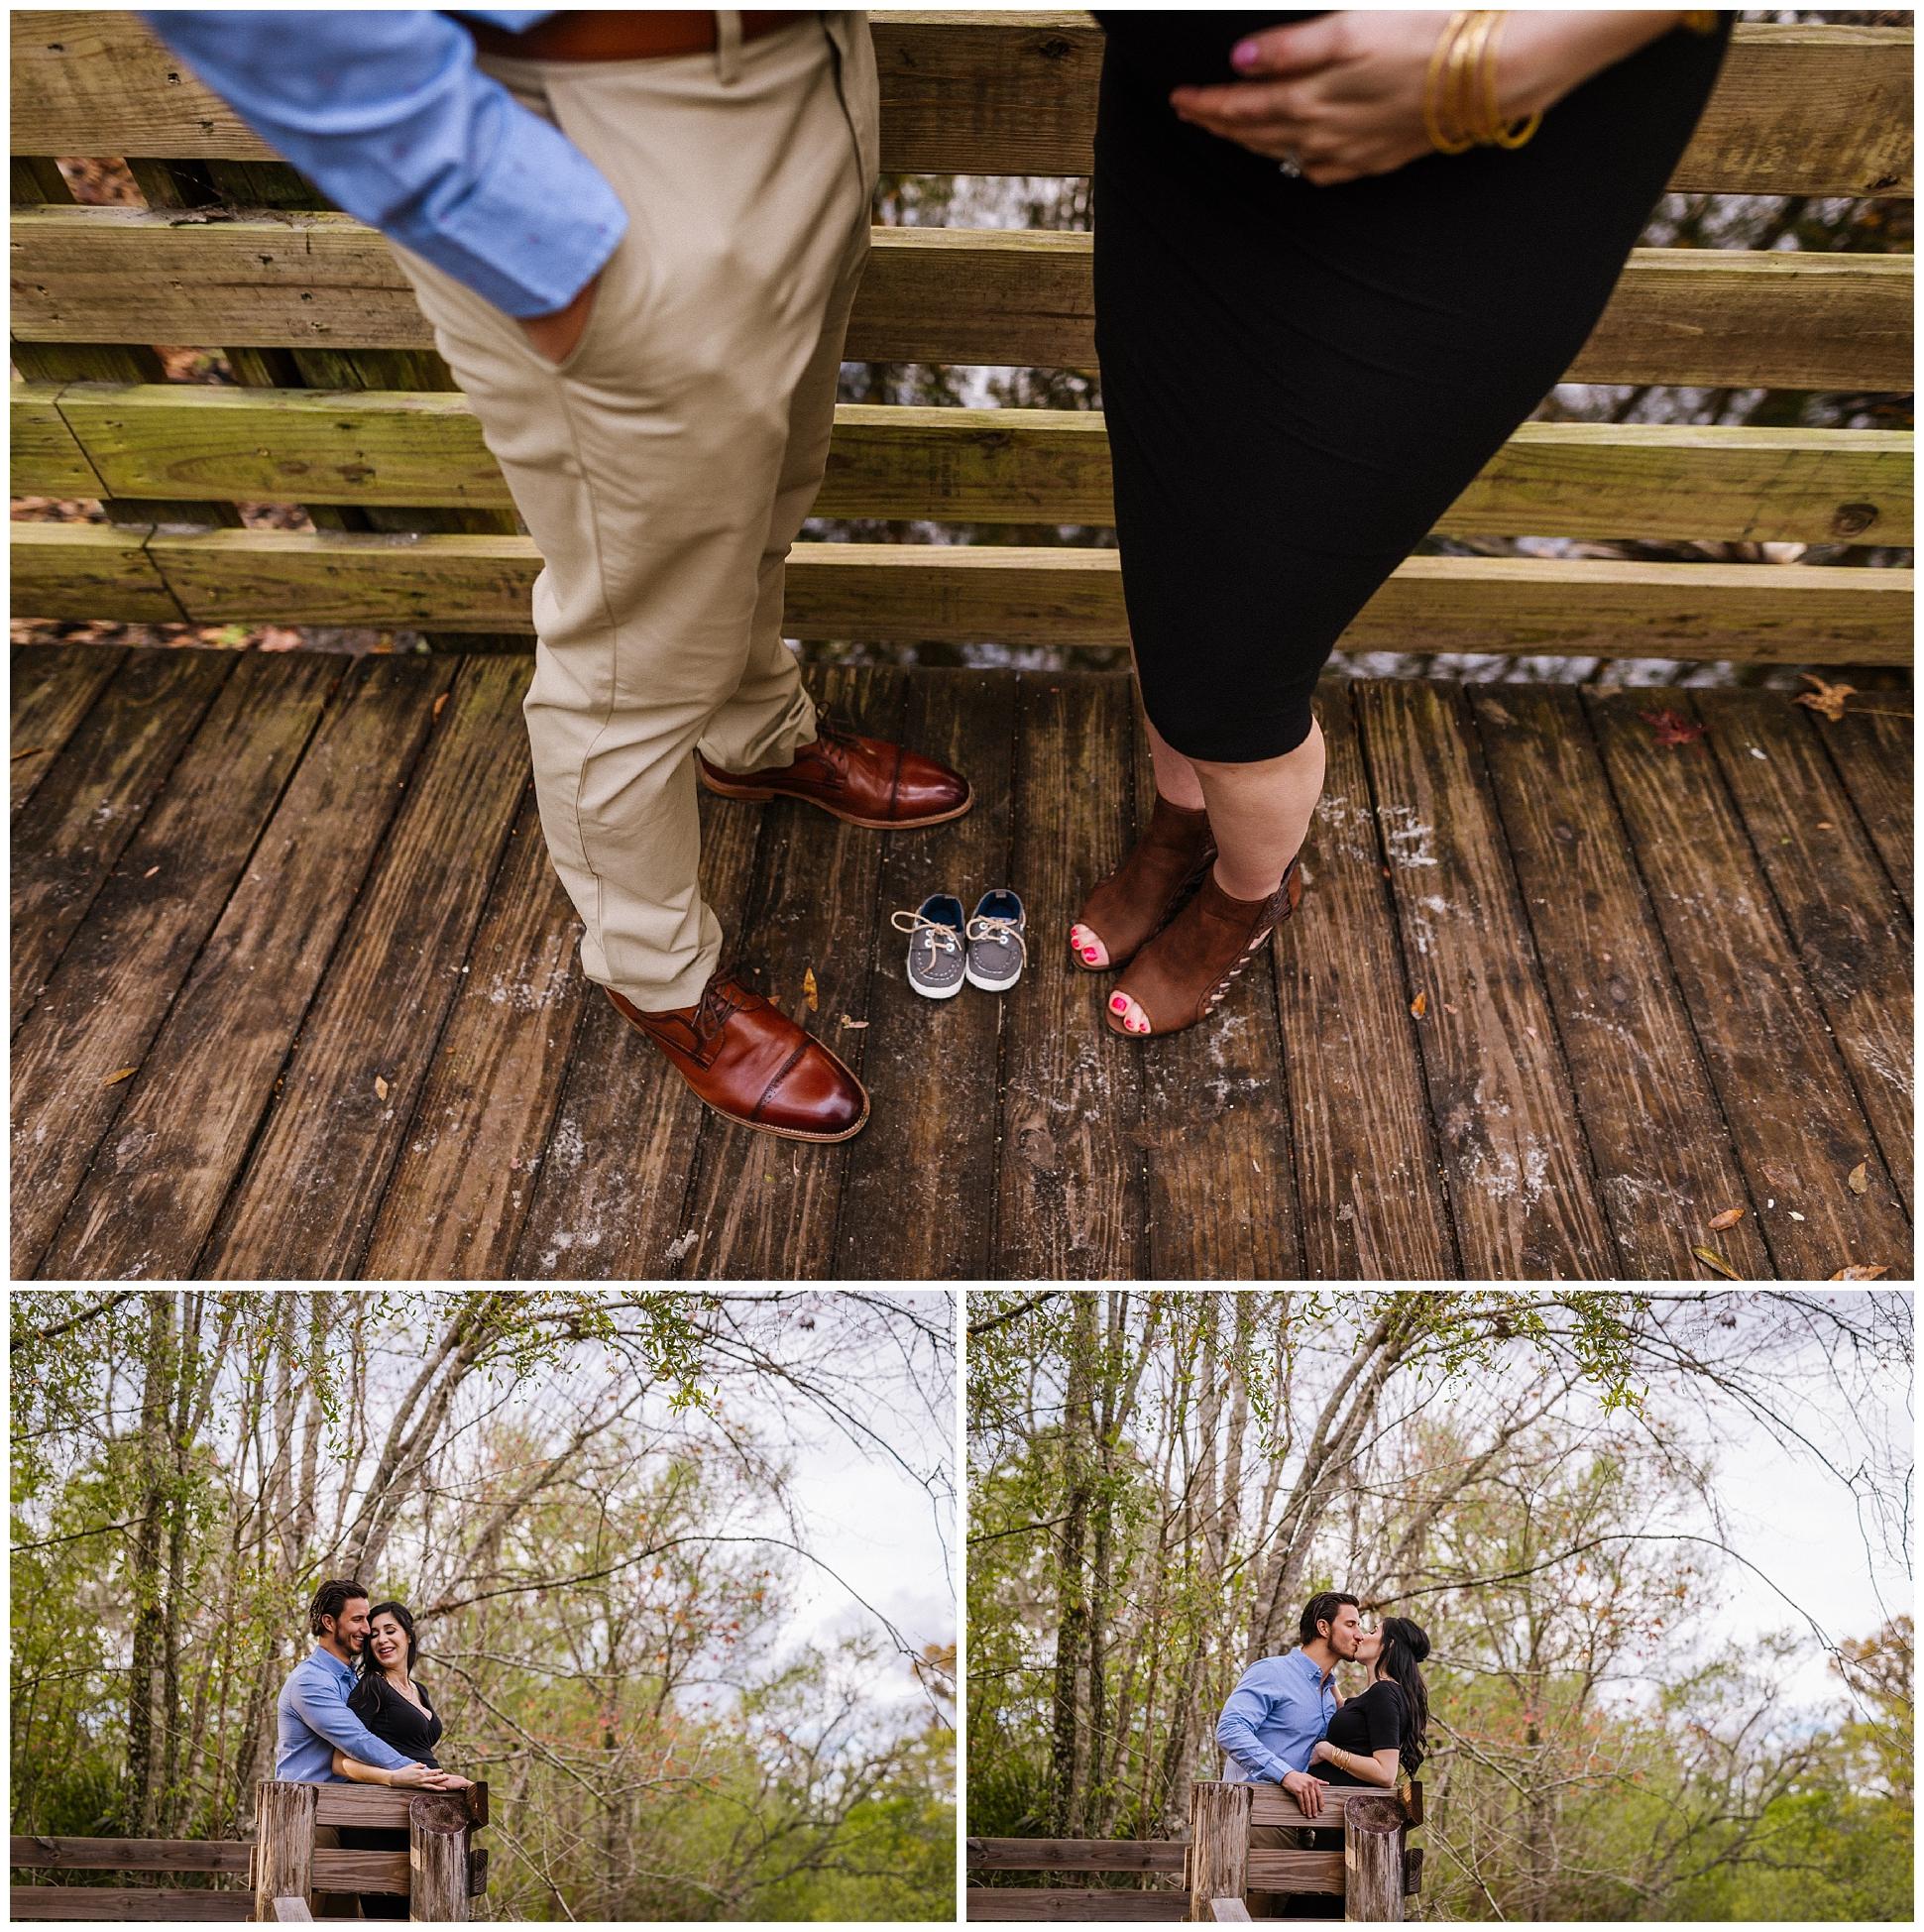 Tampa-maternity-photographer-morris-bridge-park-hip-tight-black-dress-woods_0007.jpg